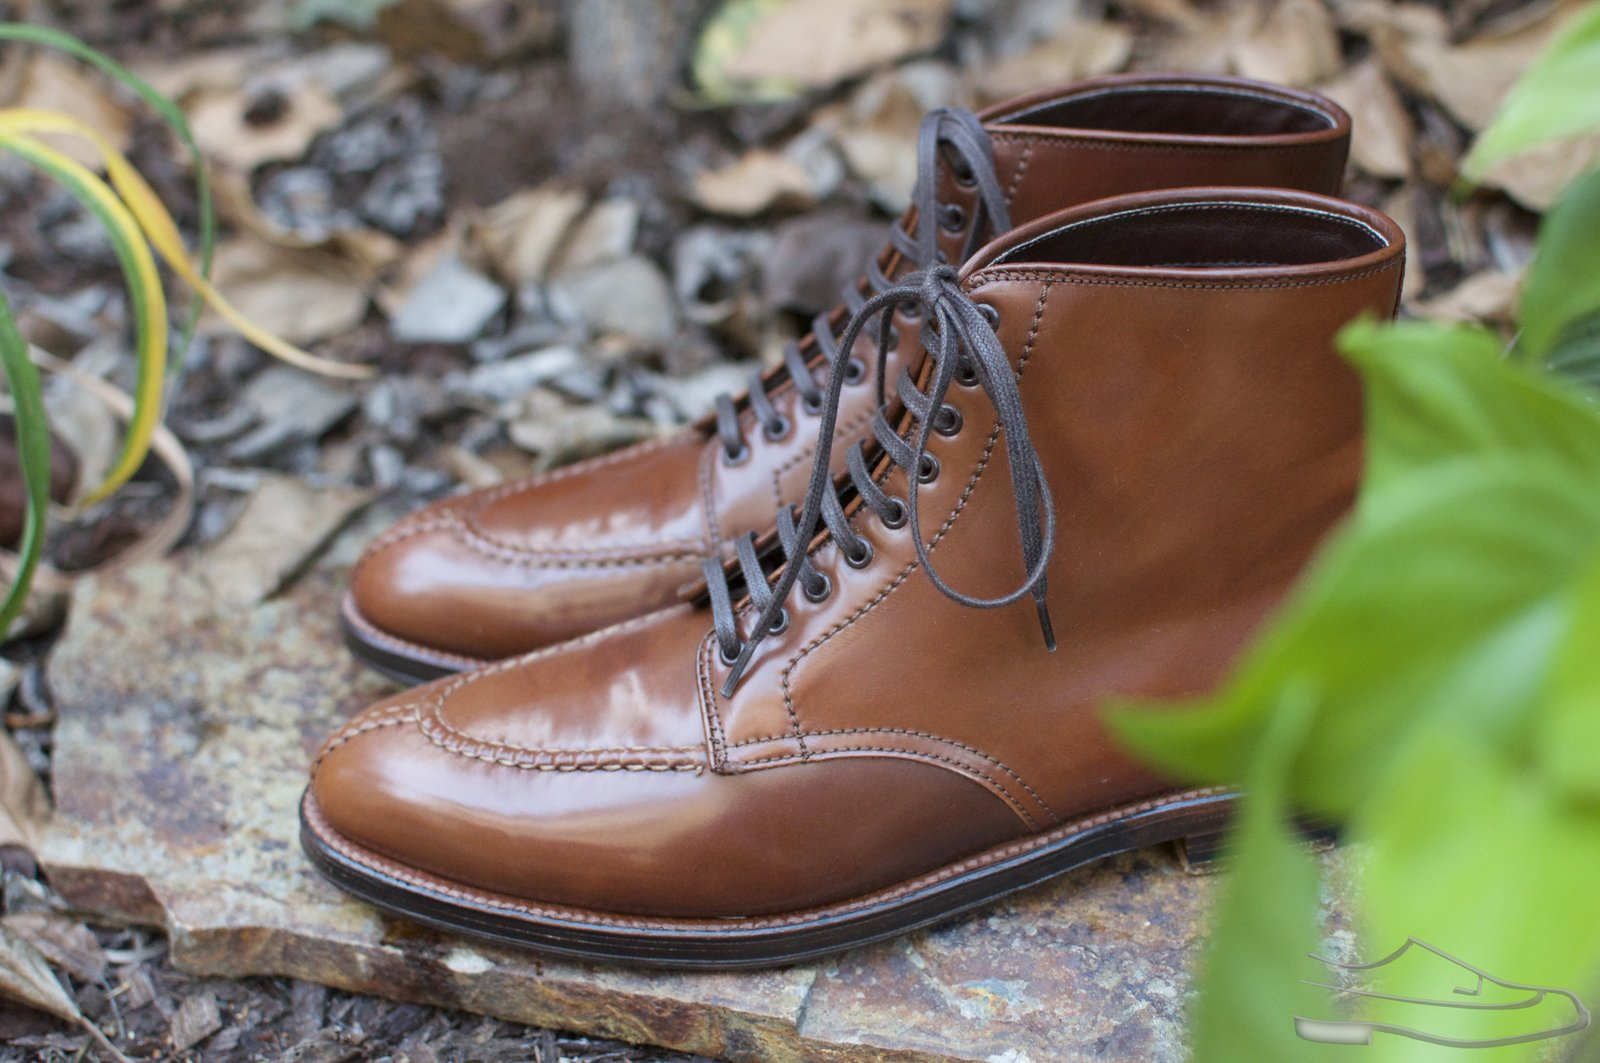 Alden Ravello Shell Cordovan NST Boots - 2020-09-17 - 2.jpg